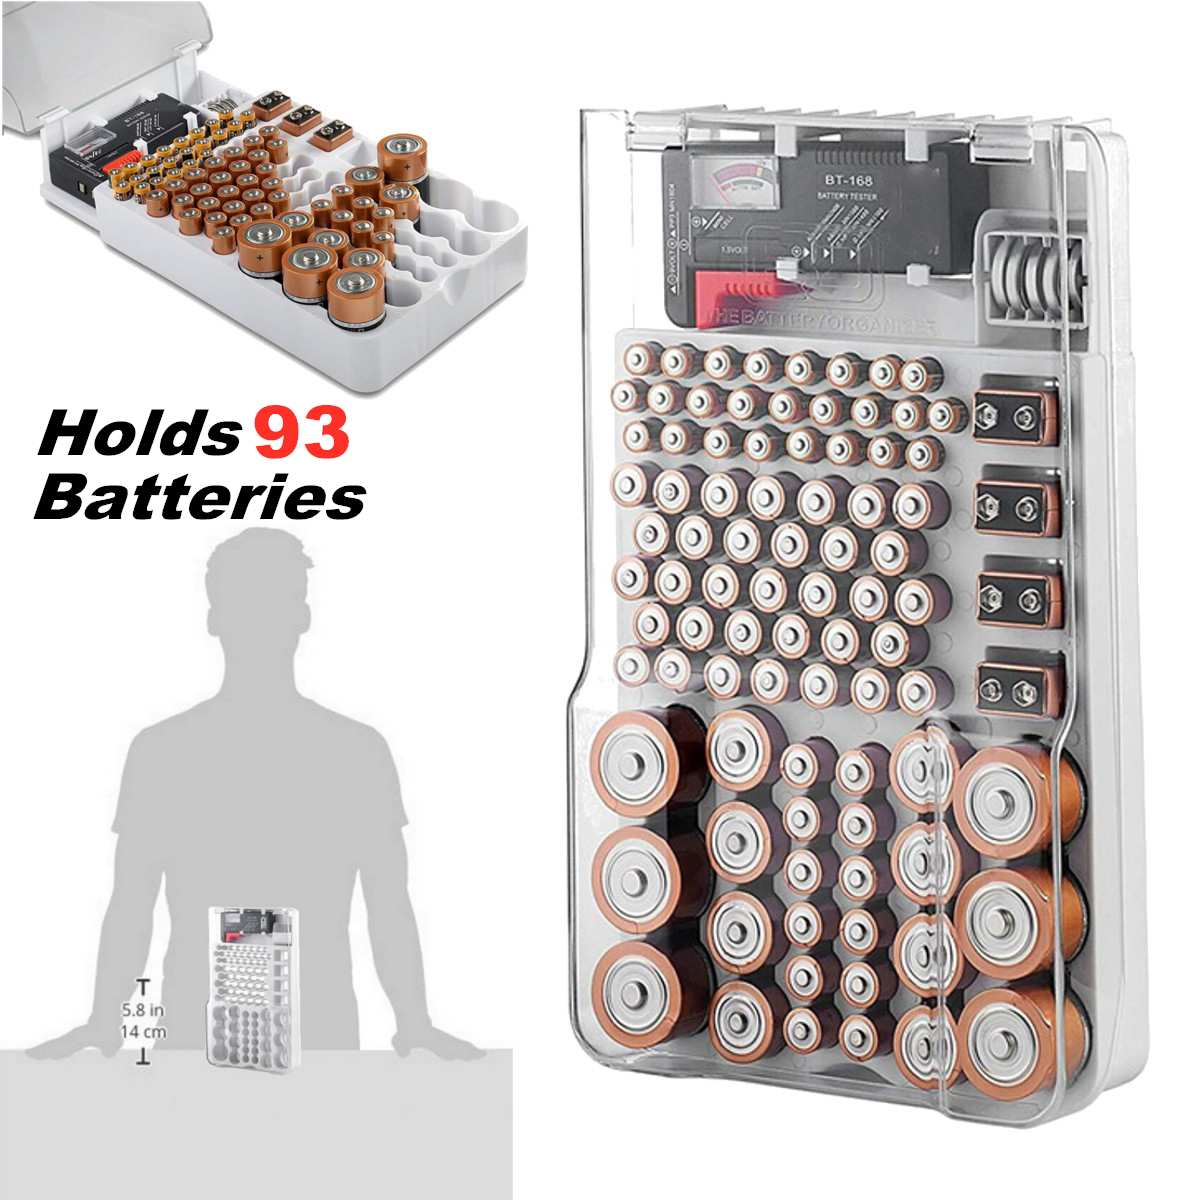 Case-Accessories Storage-Box Measuring-Organizer Battery-Capacity-Tester 93 Transparent